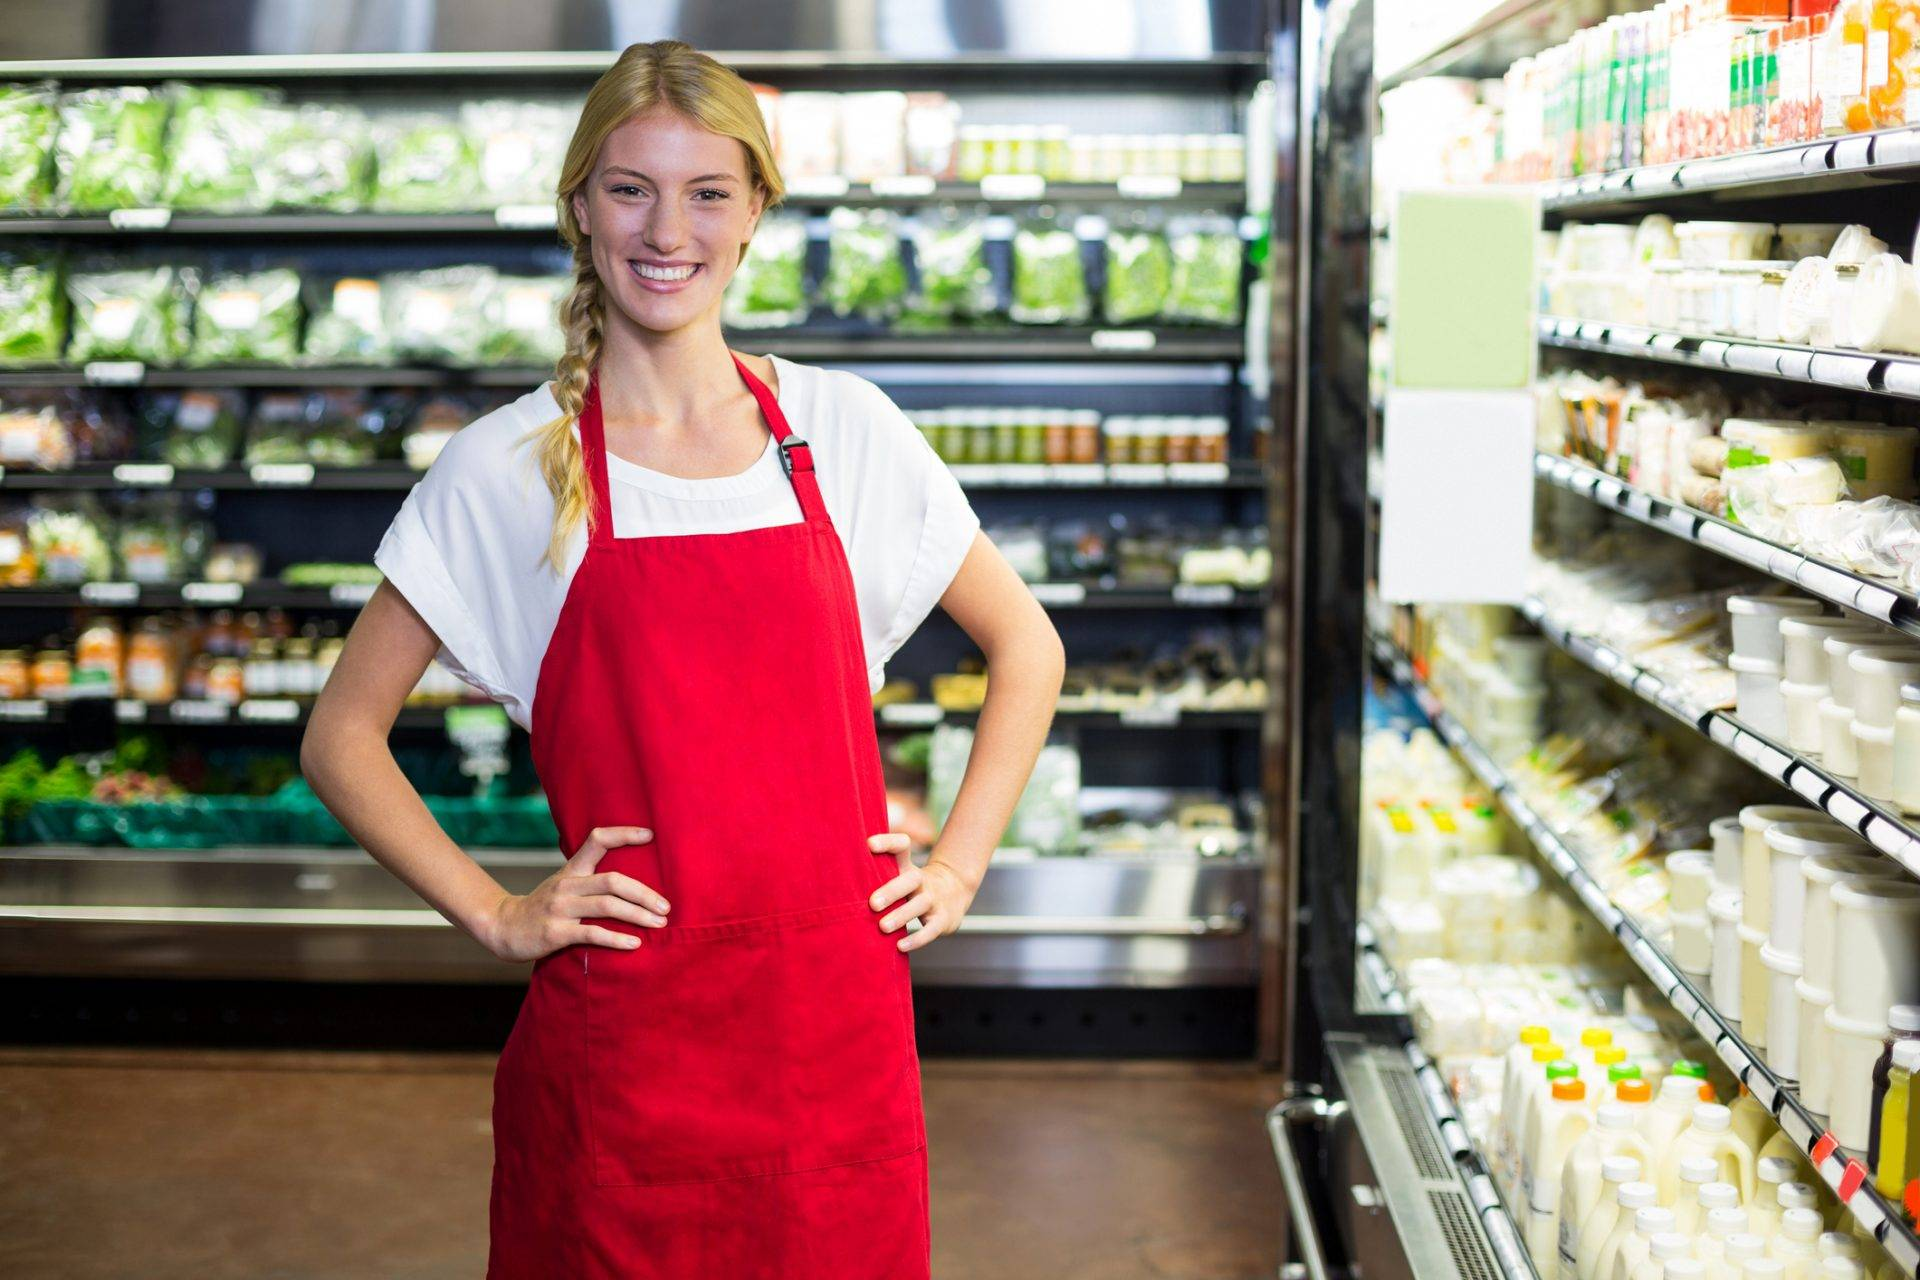 Abschlussprüfung Verkäufer 2020